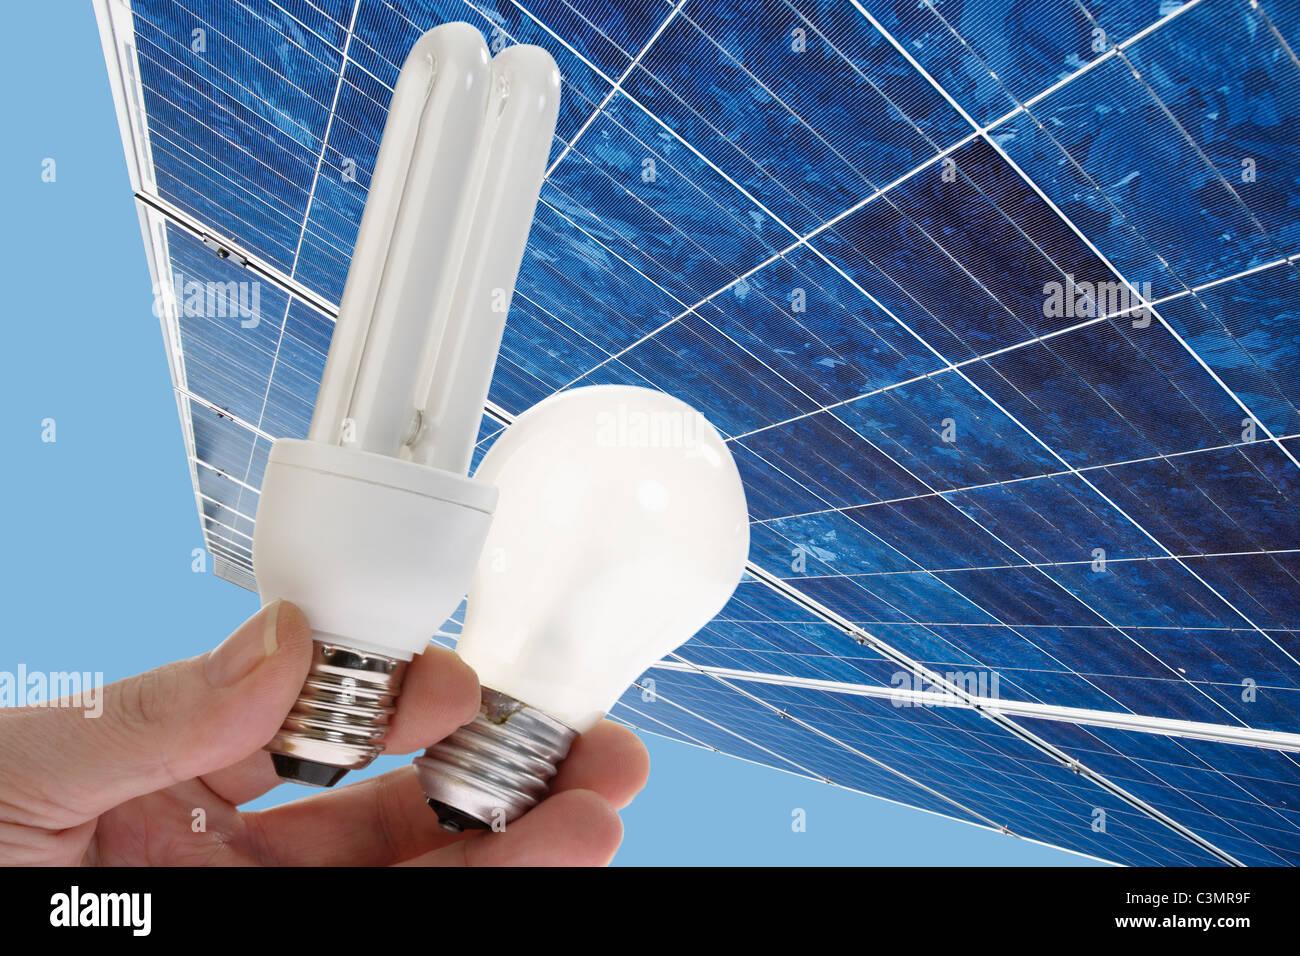 Human hand holding energy saving light, bulb against  solar panel, close up. - Stock Image